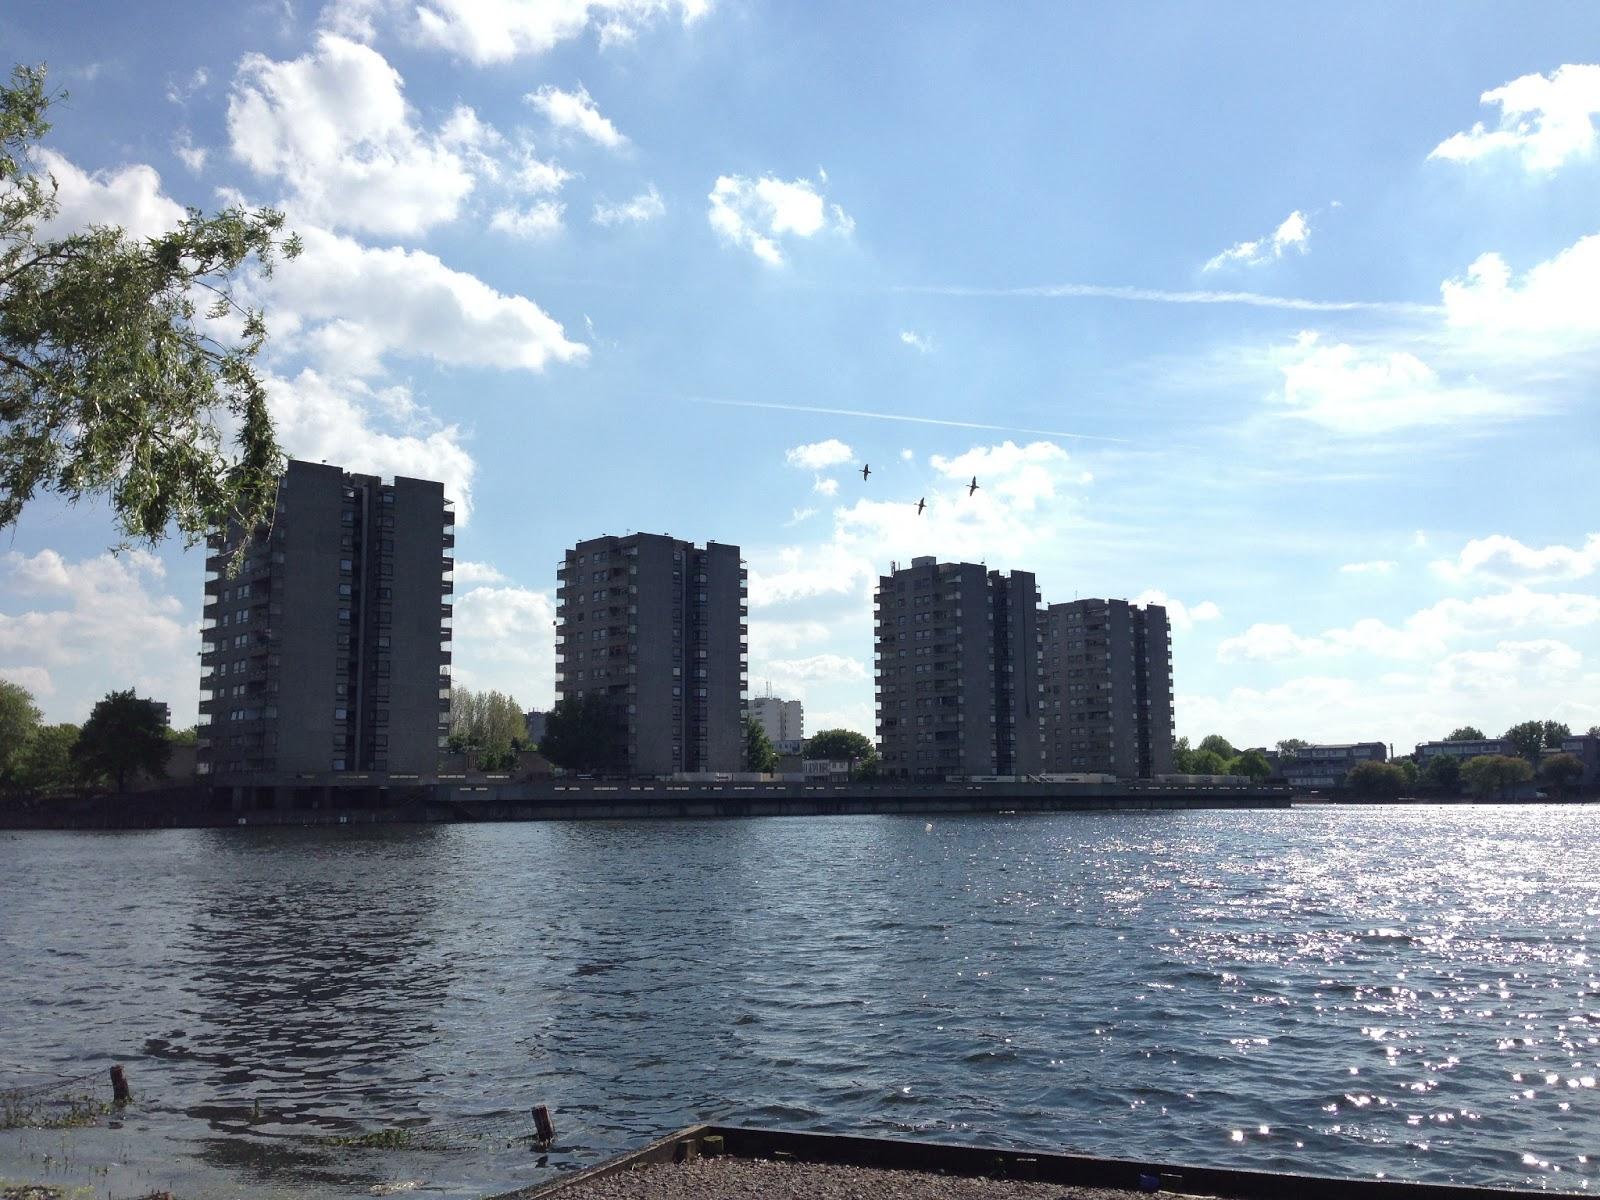 London cycling: Thamesmead's Clockwork Orange, Greenwich ...